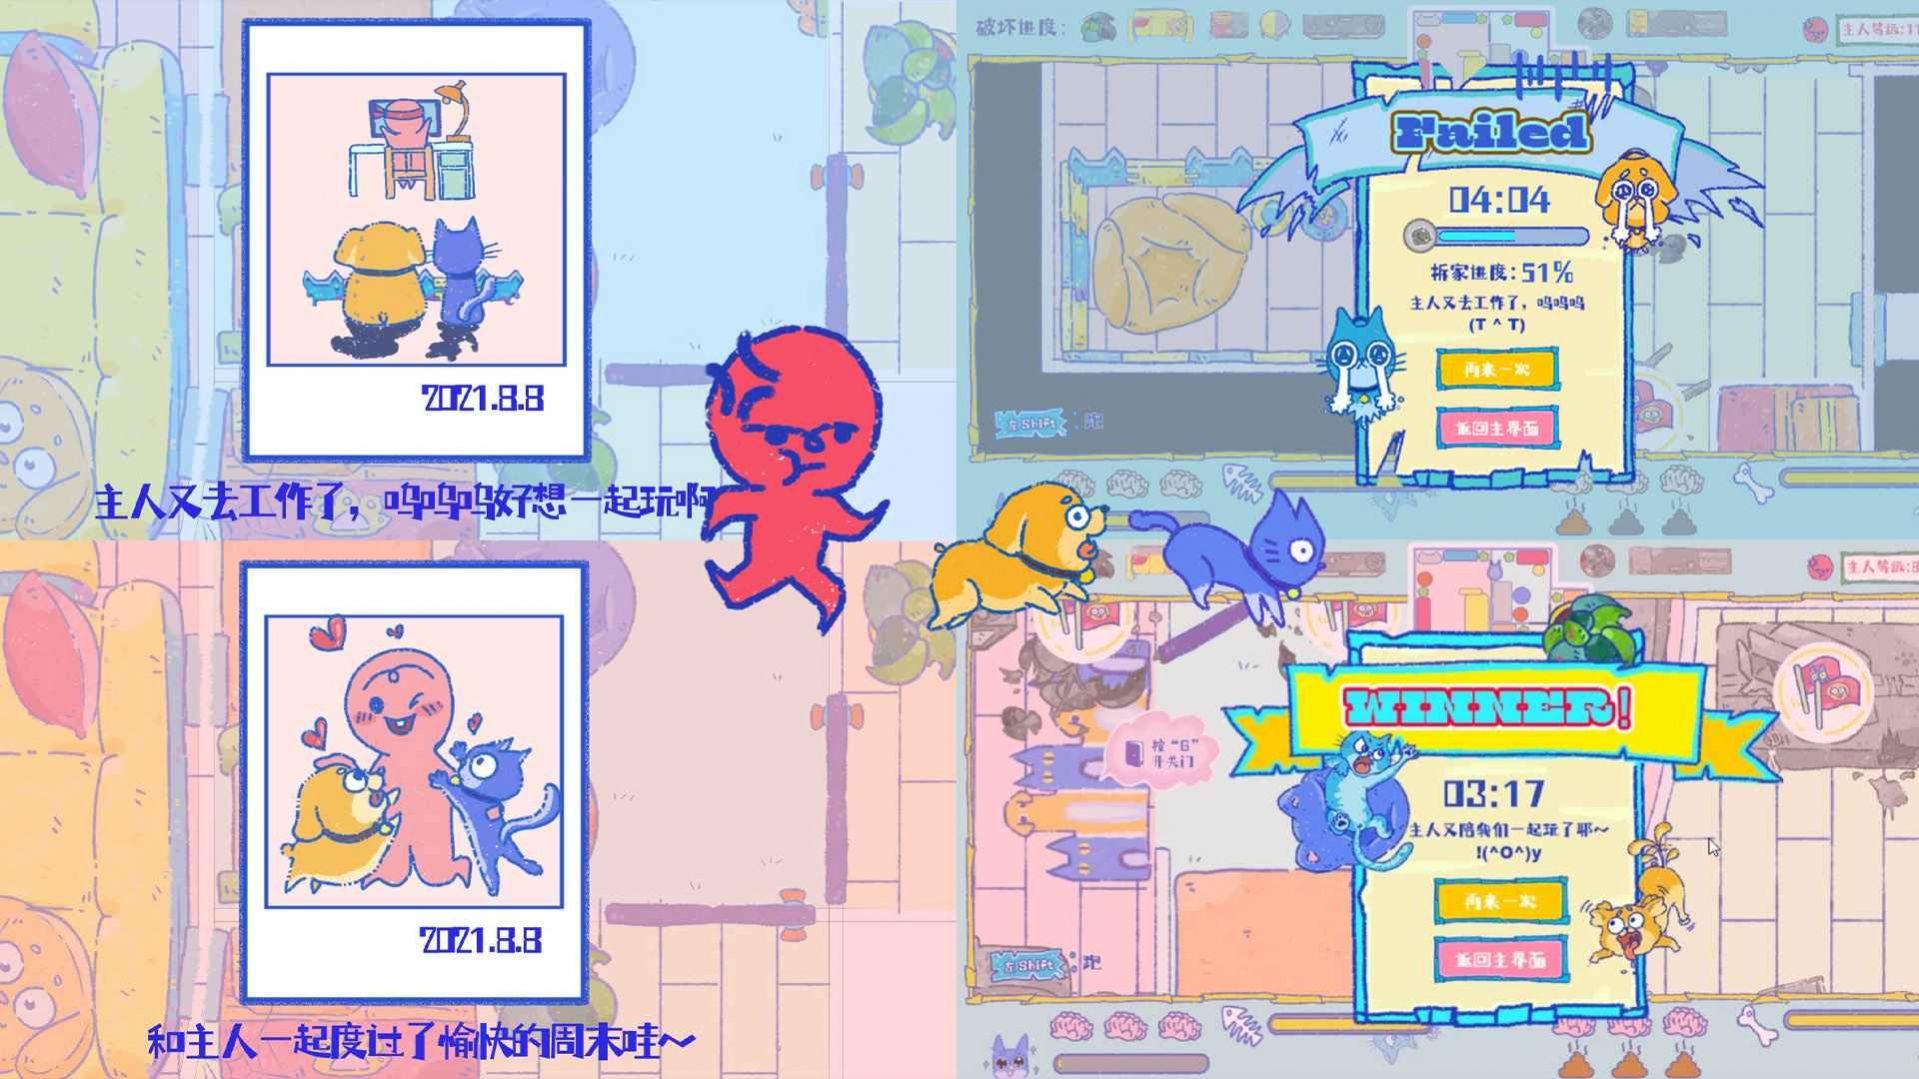 Messy Up模组游戏最新安卓版图片1